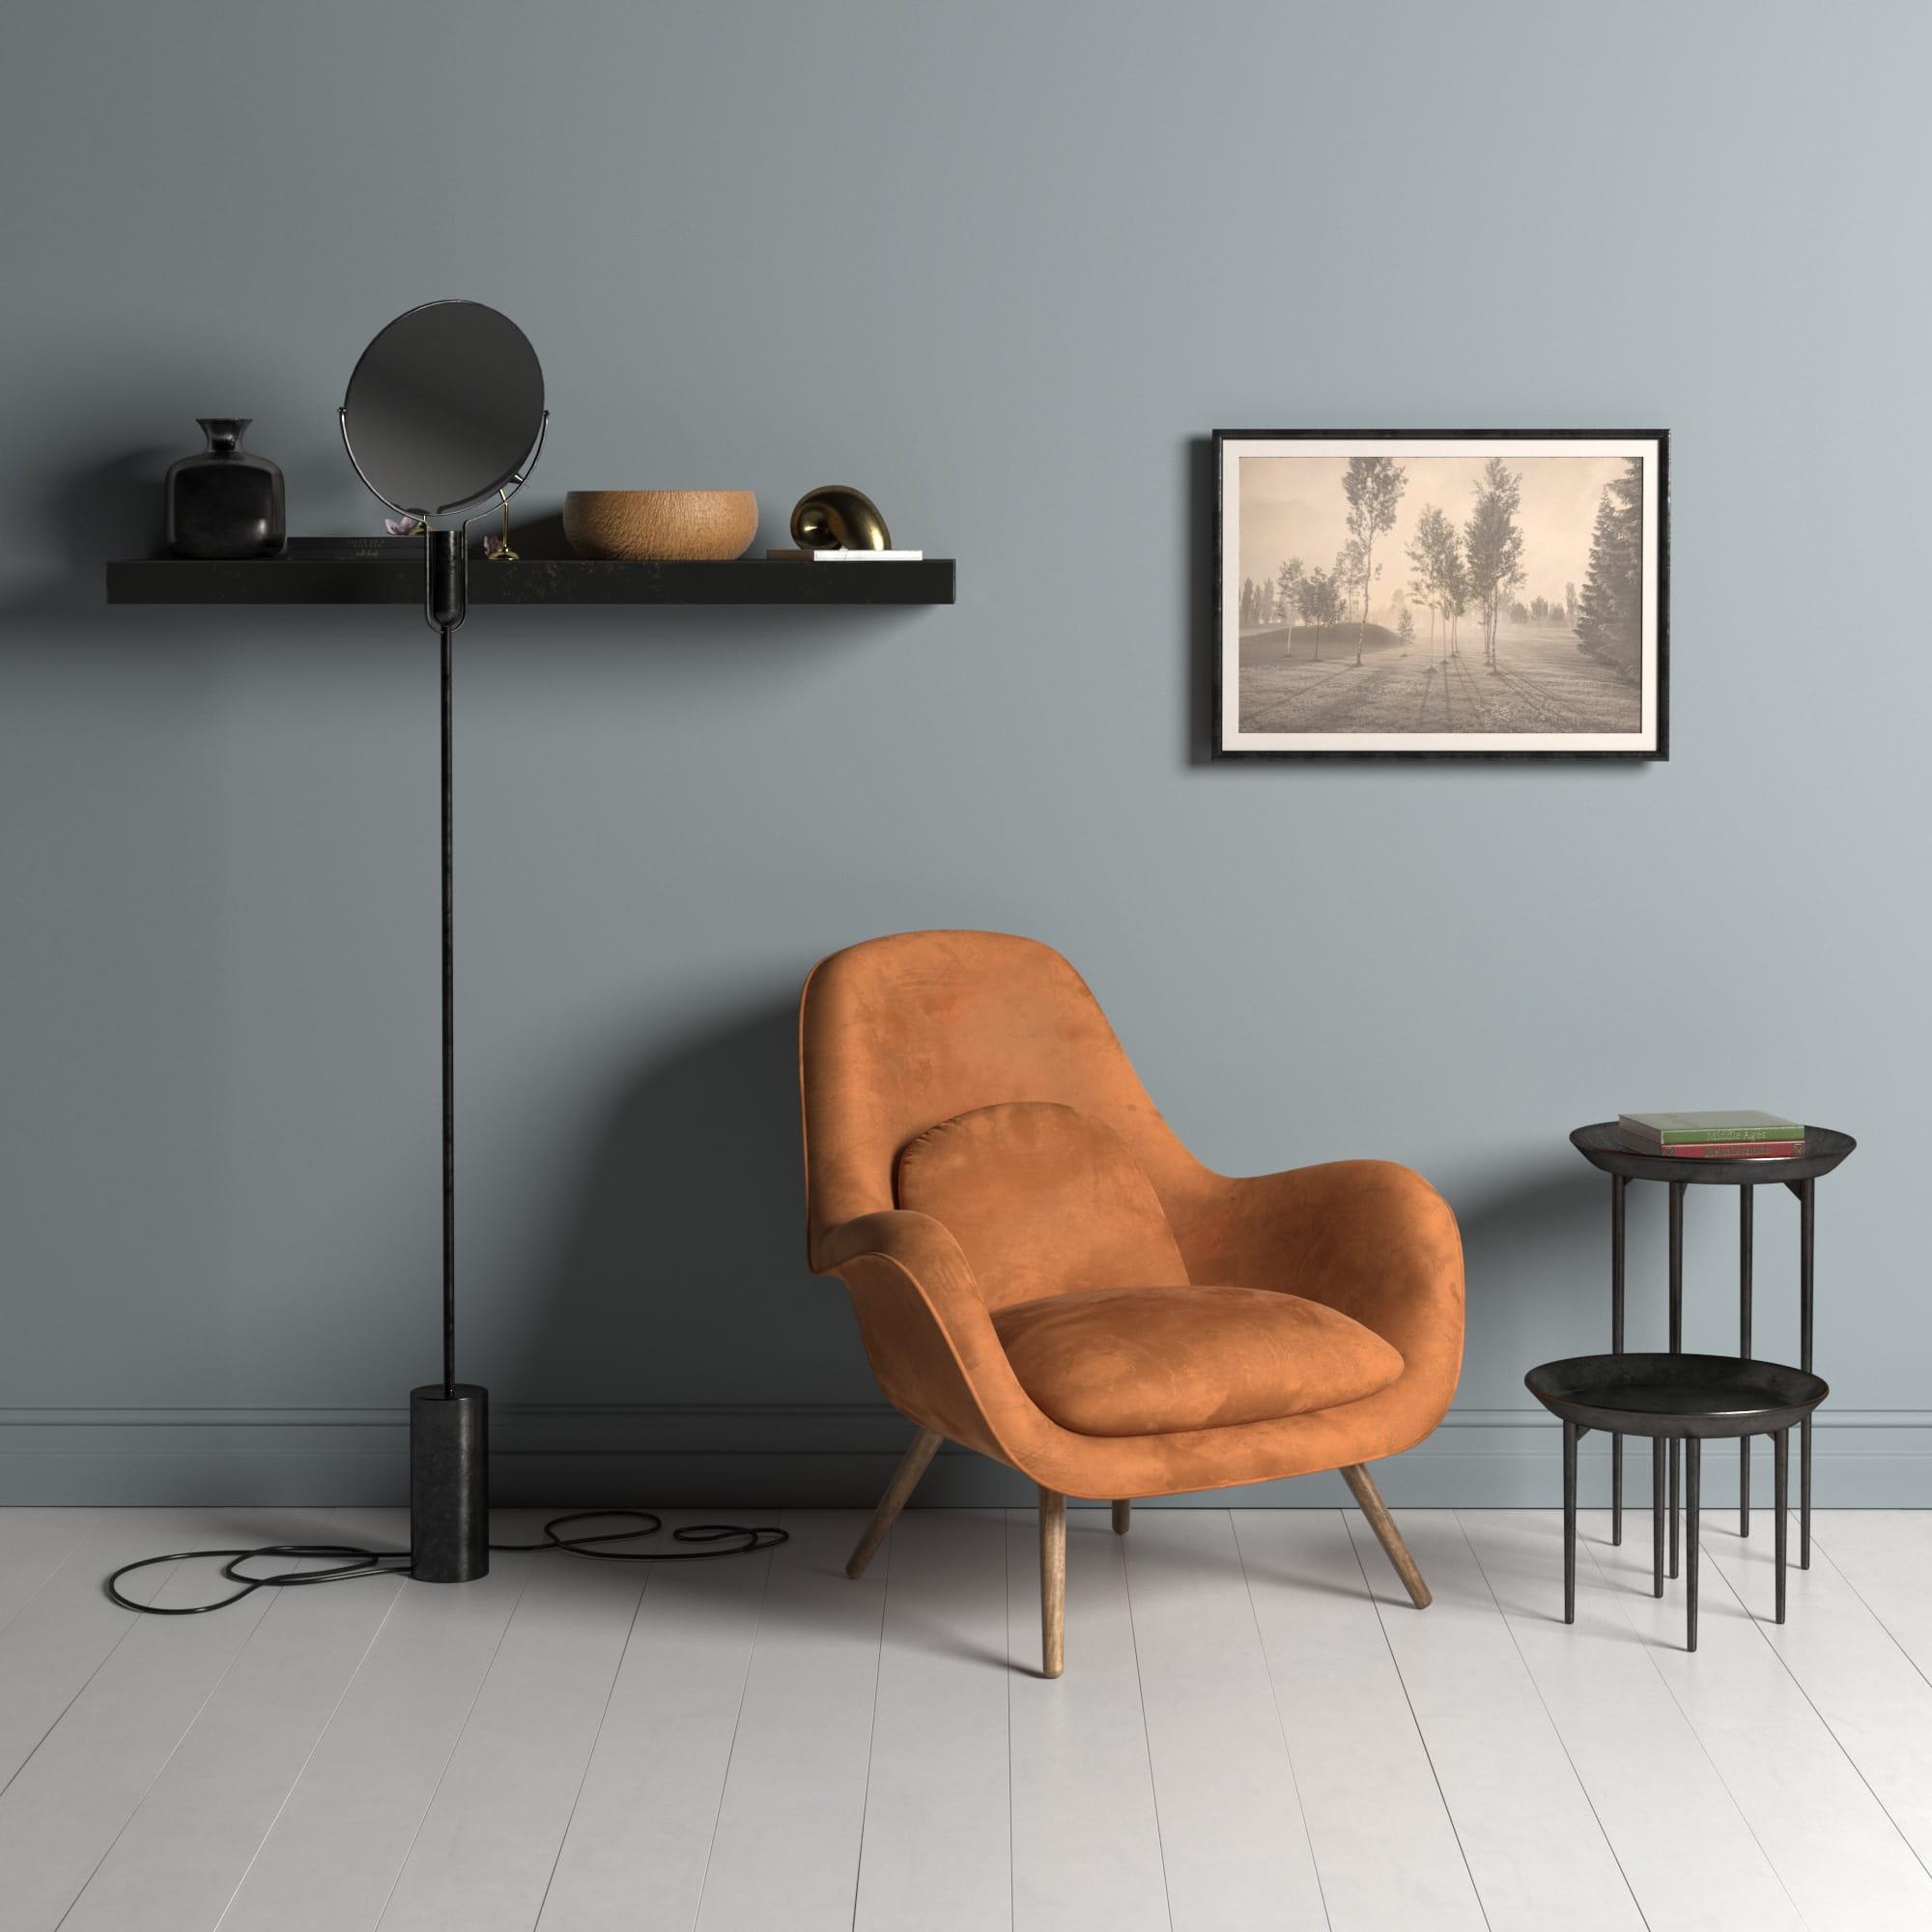 furniture set 7 AM225